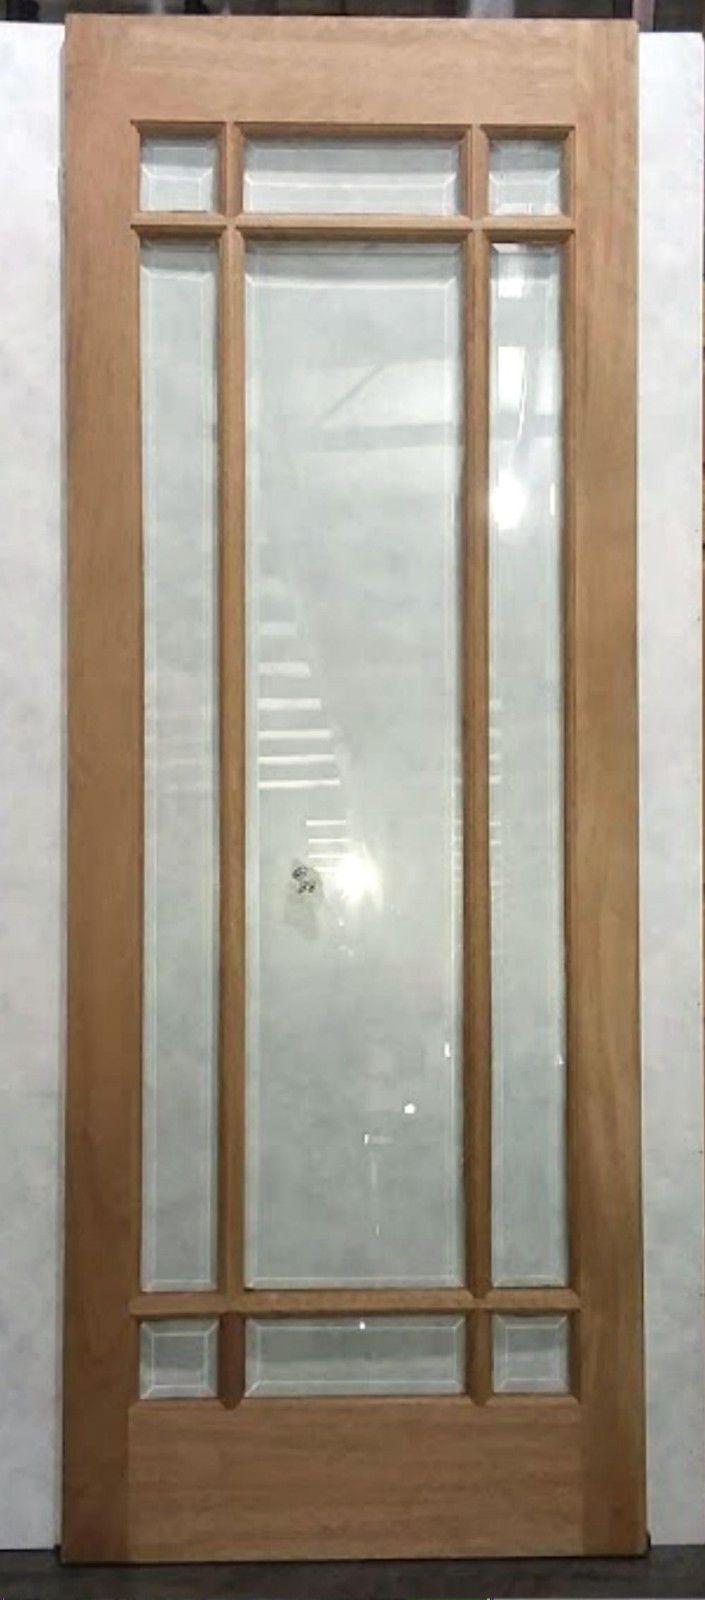 Doors 85892 Arts And Crafts Solid Mahogany Wood Slab Door Beveled